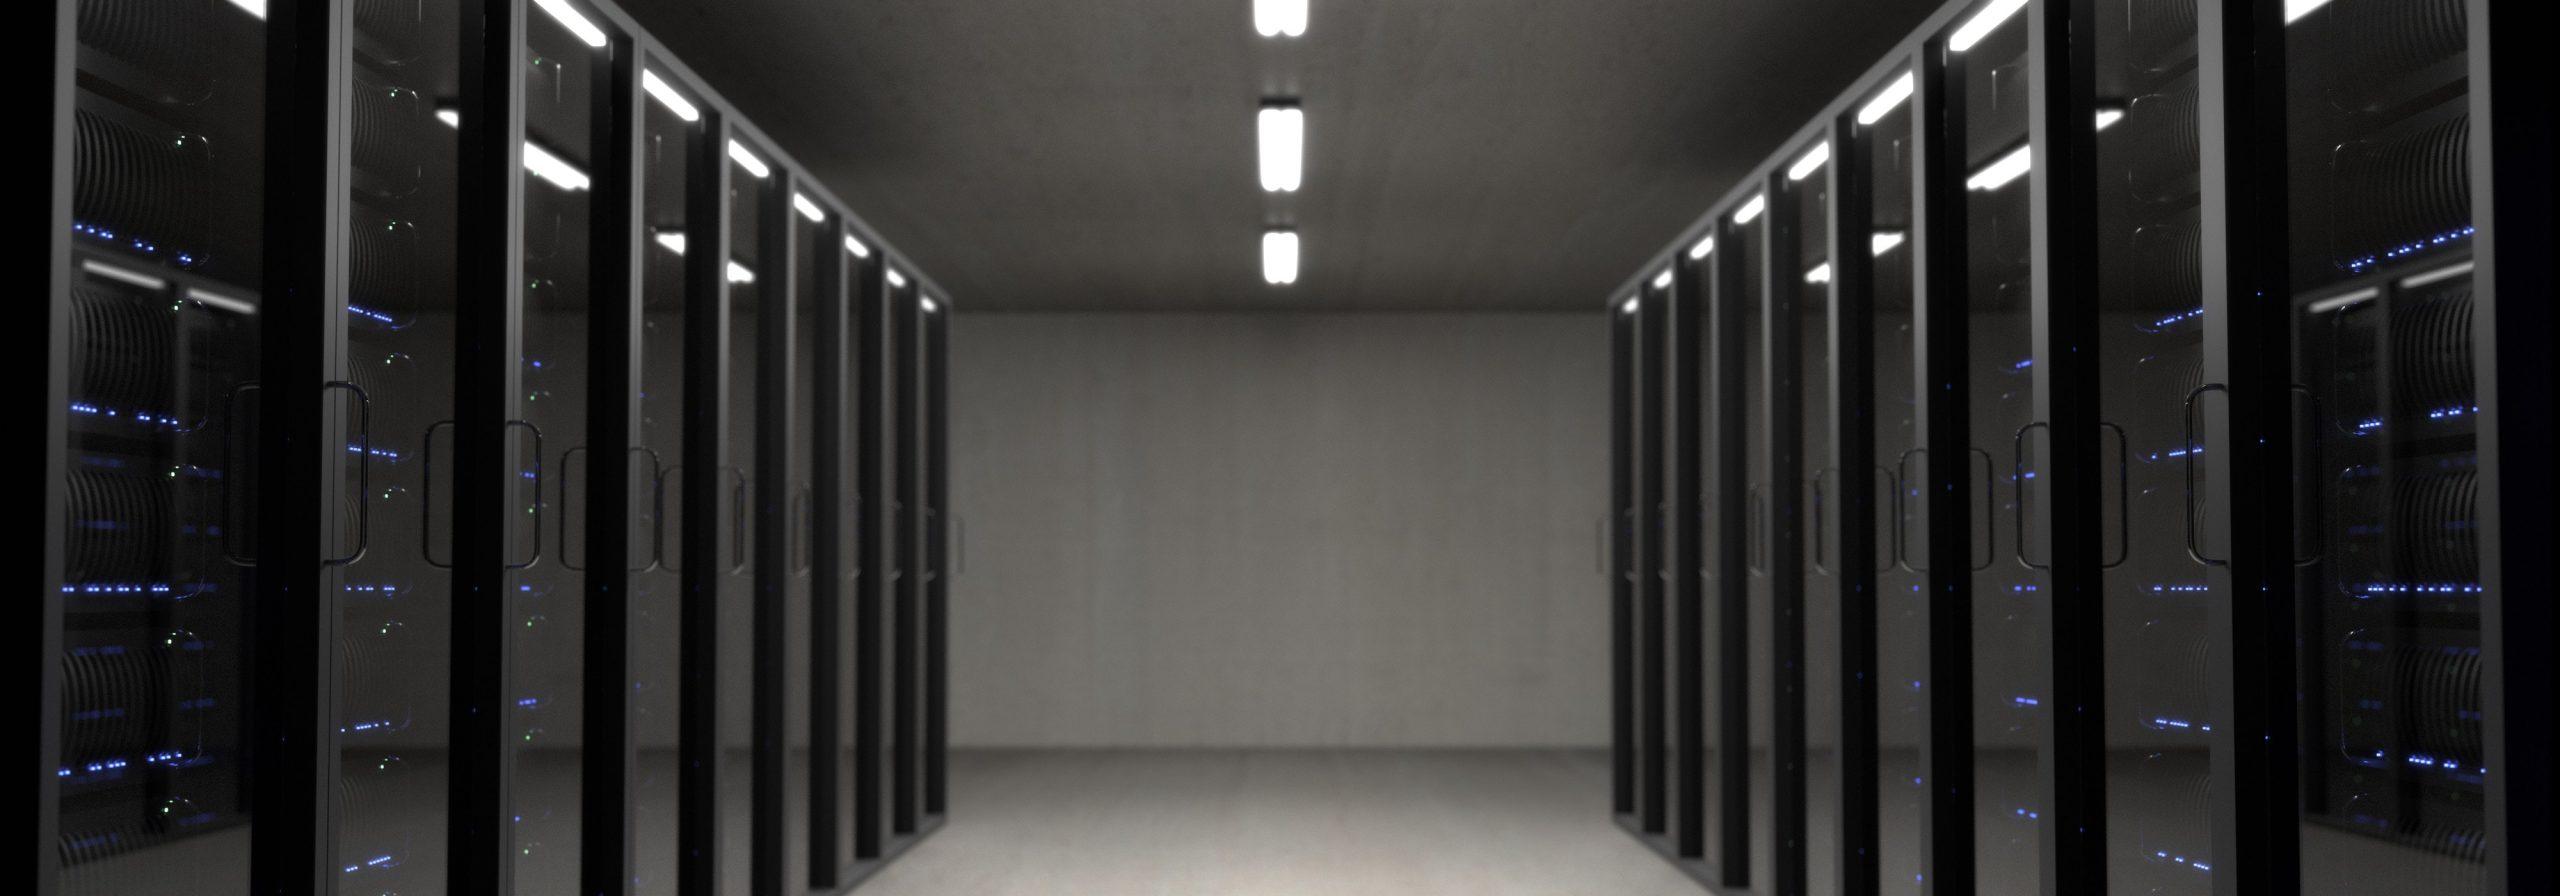 matrice-kvm-kairos-data-energie-datacenter